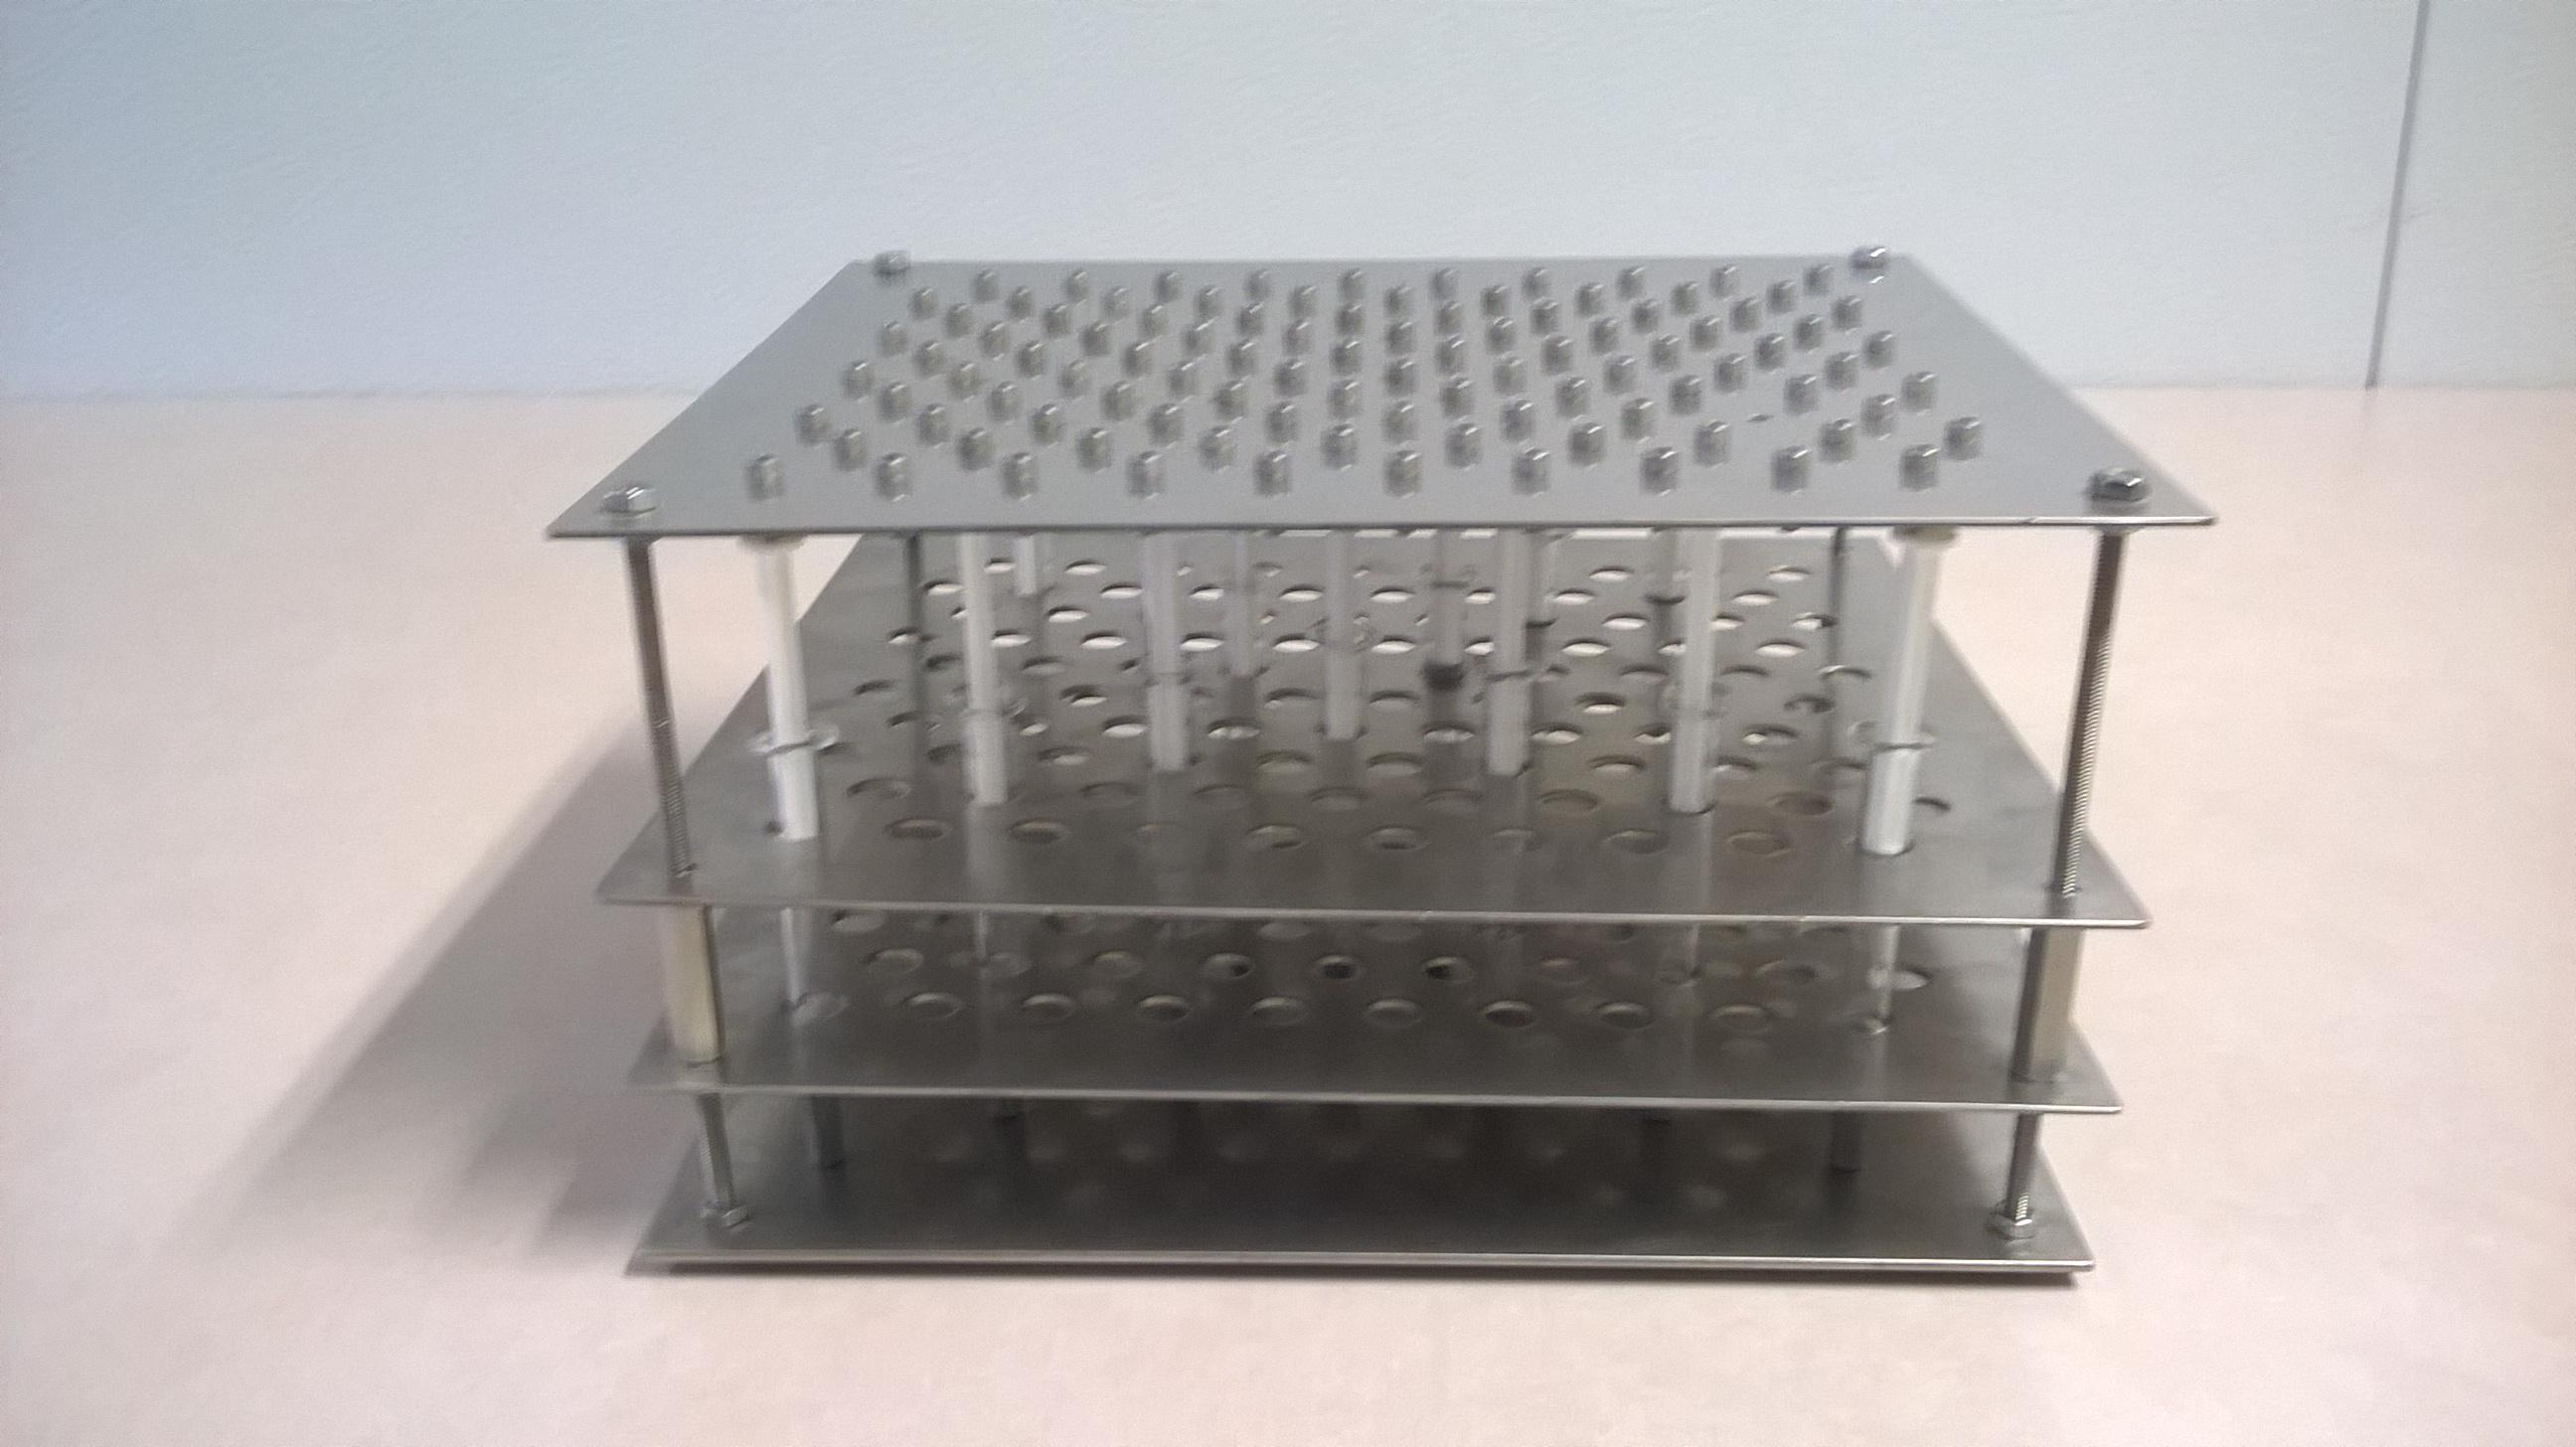 Prefilled Syringe Sterilization Device